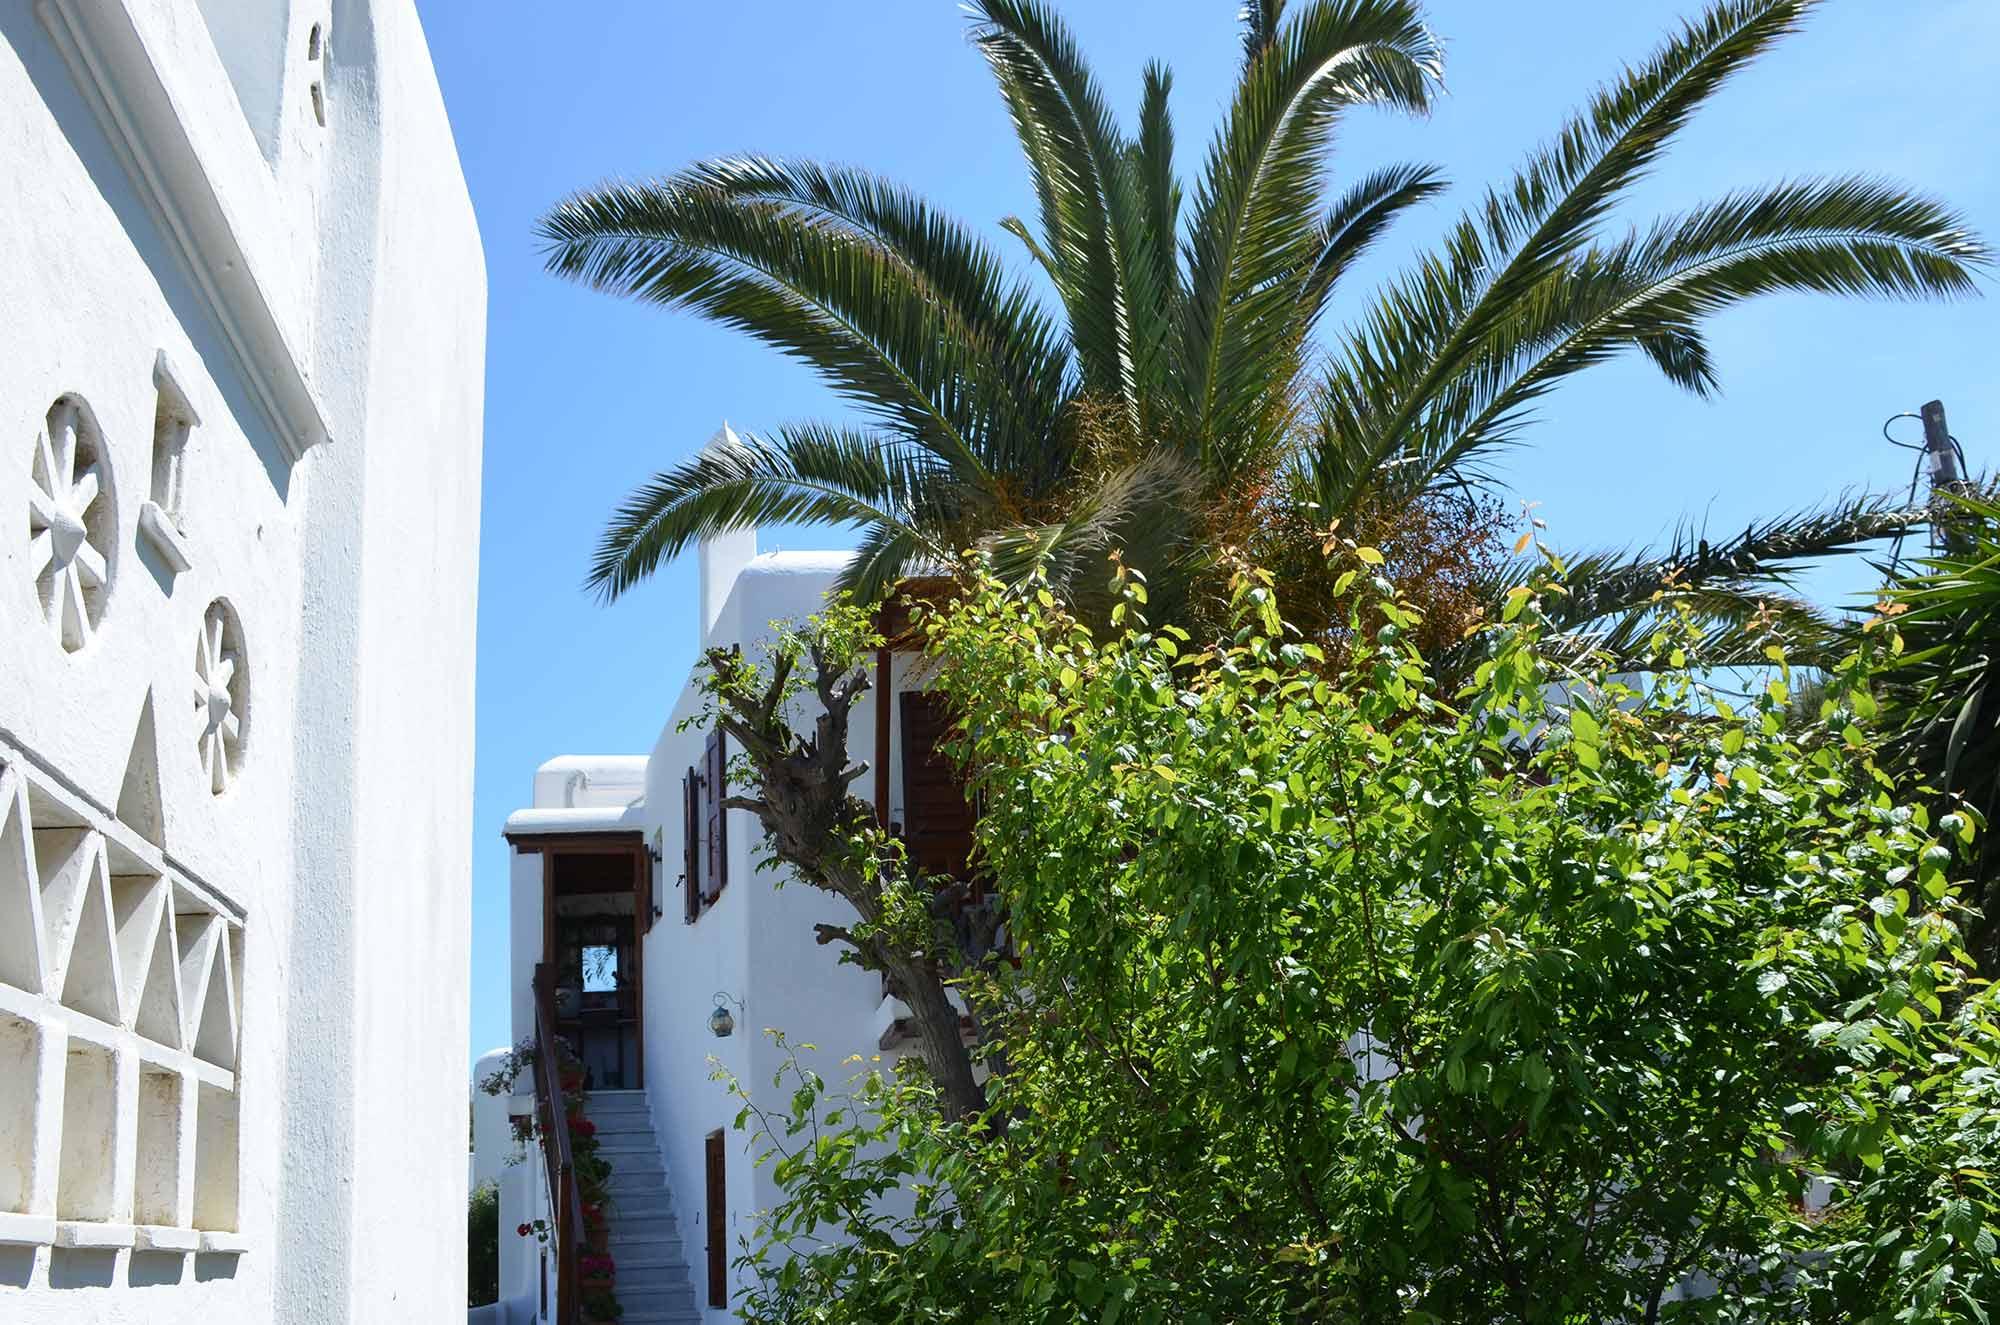 Villa Pinelopi - Studios for rent in Mykonos Town